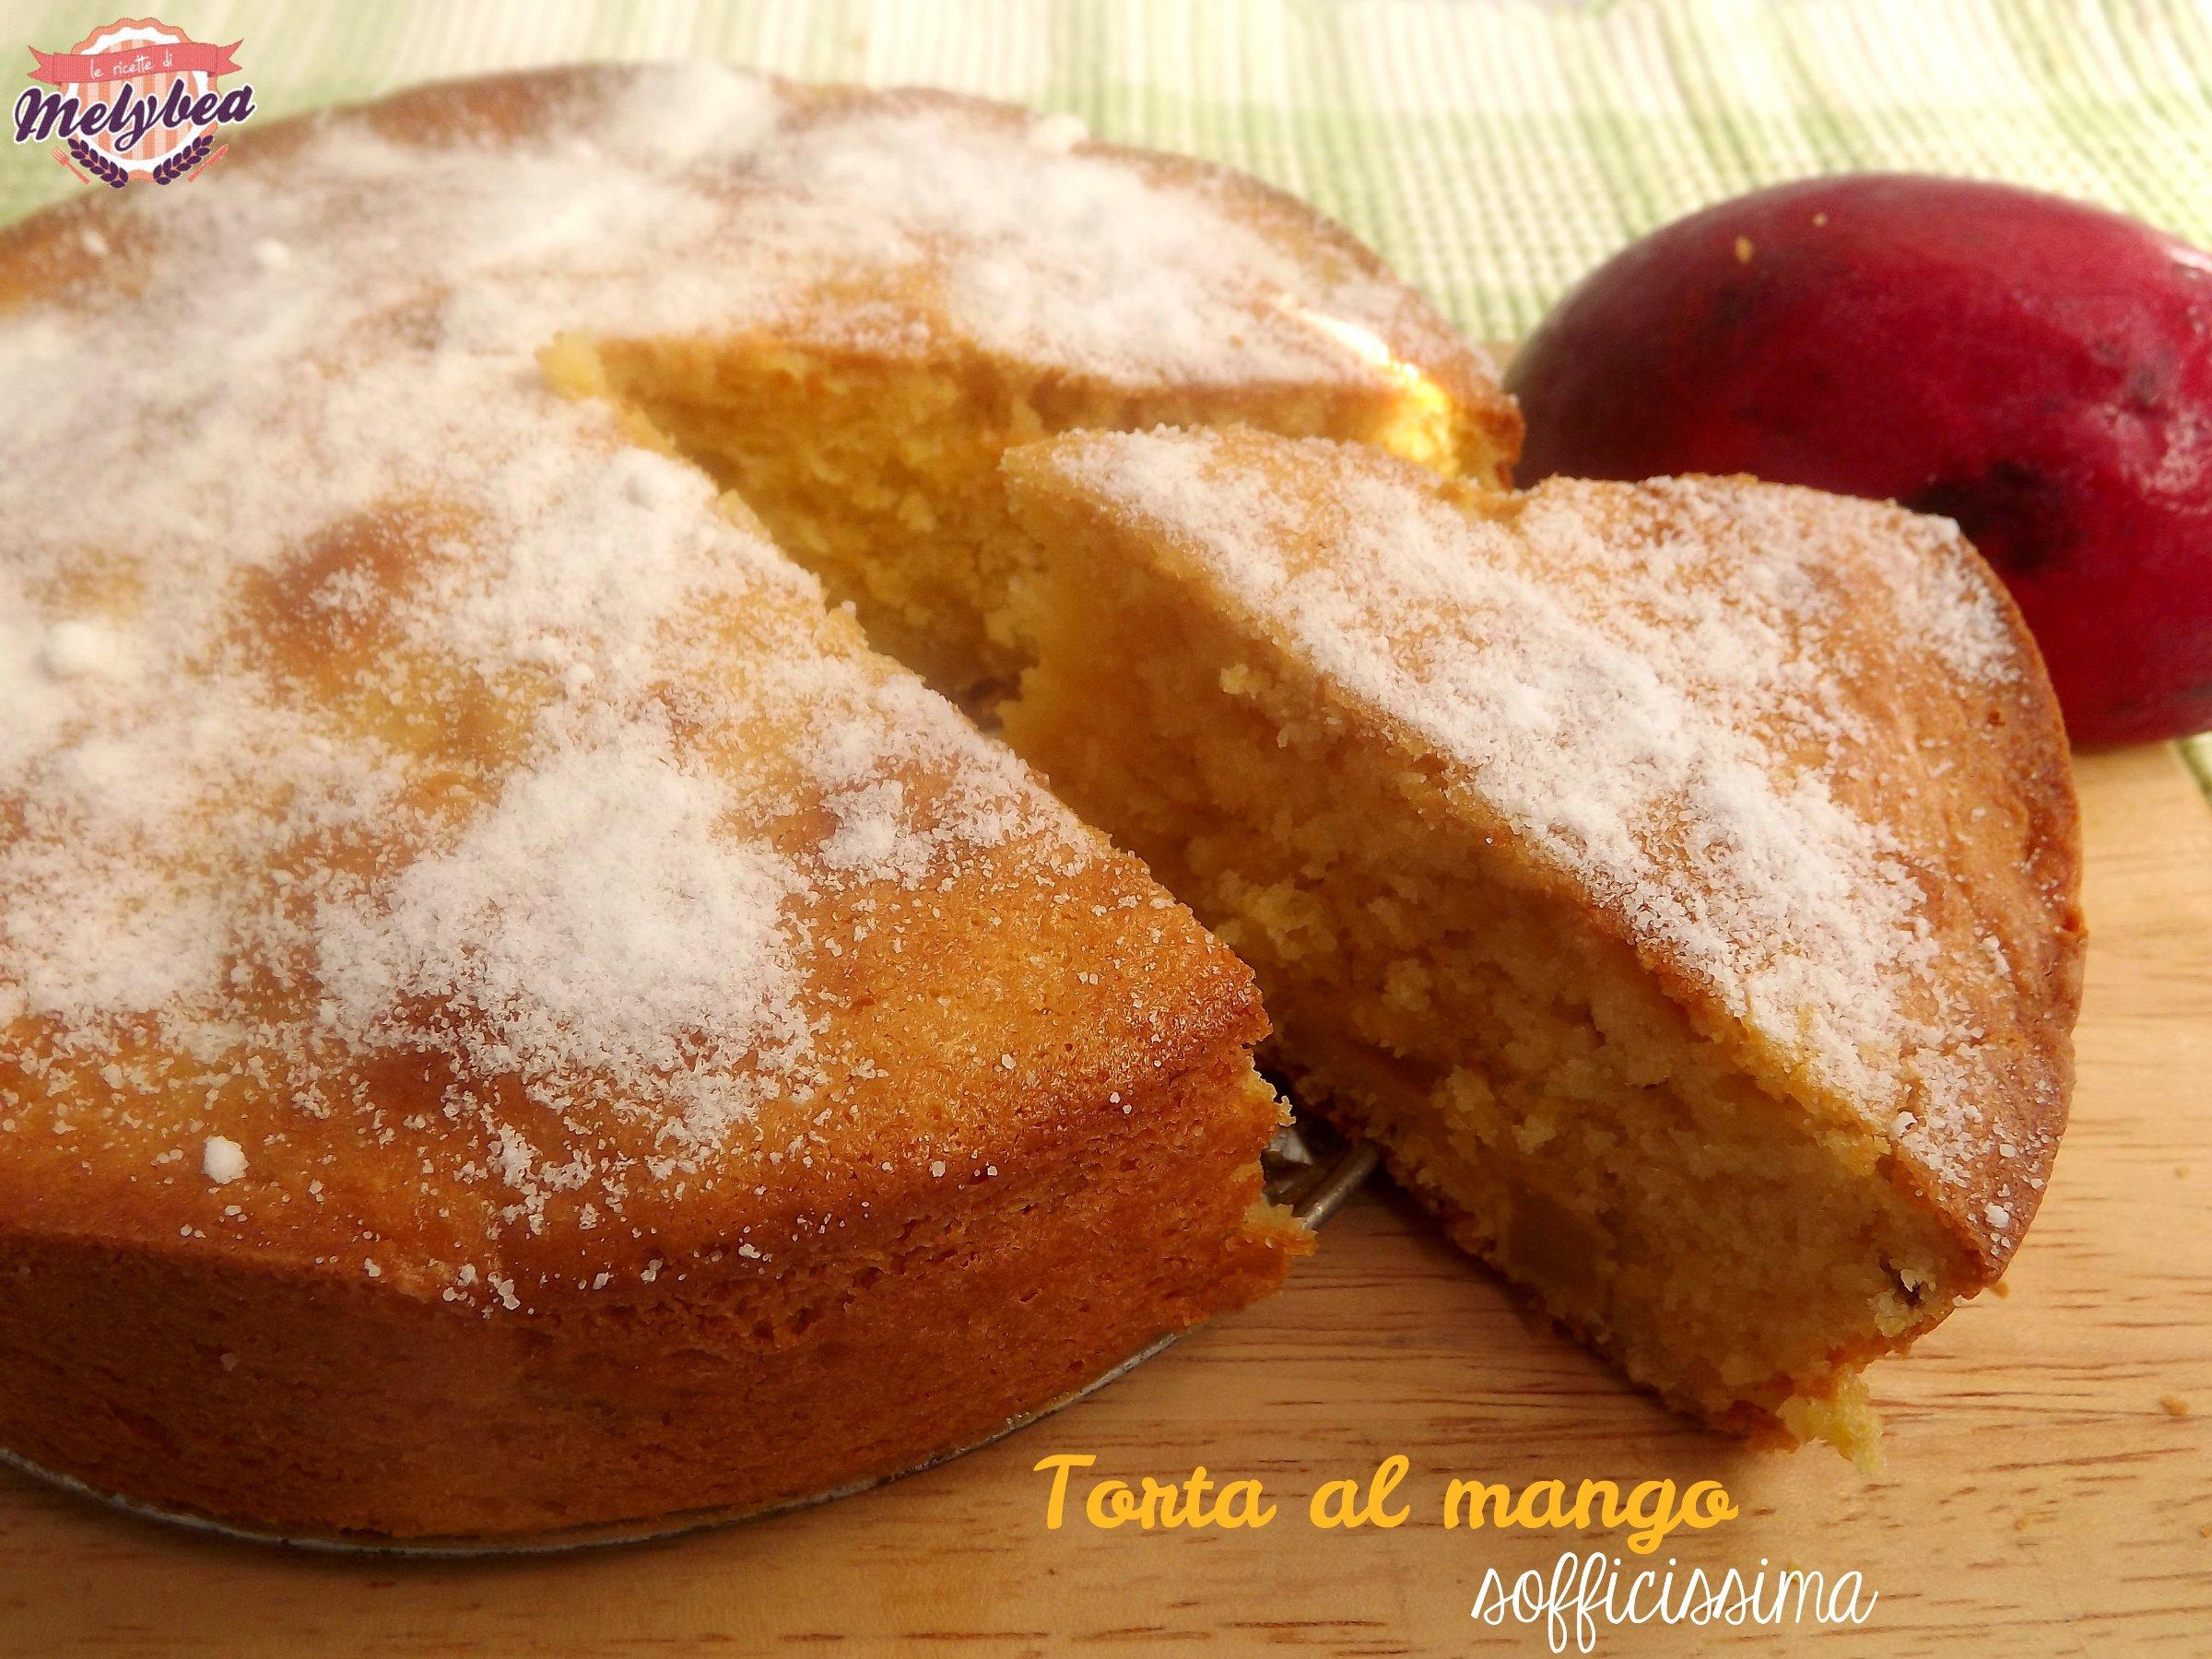 torta al mango sofficissima